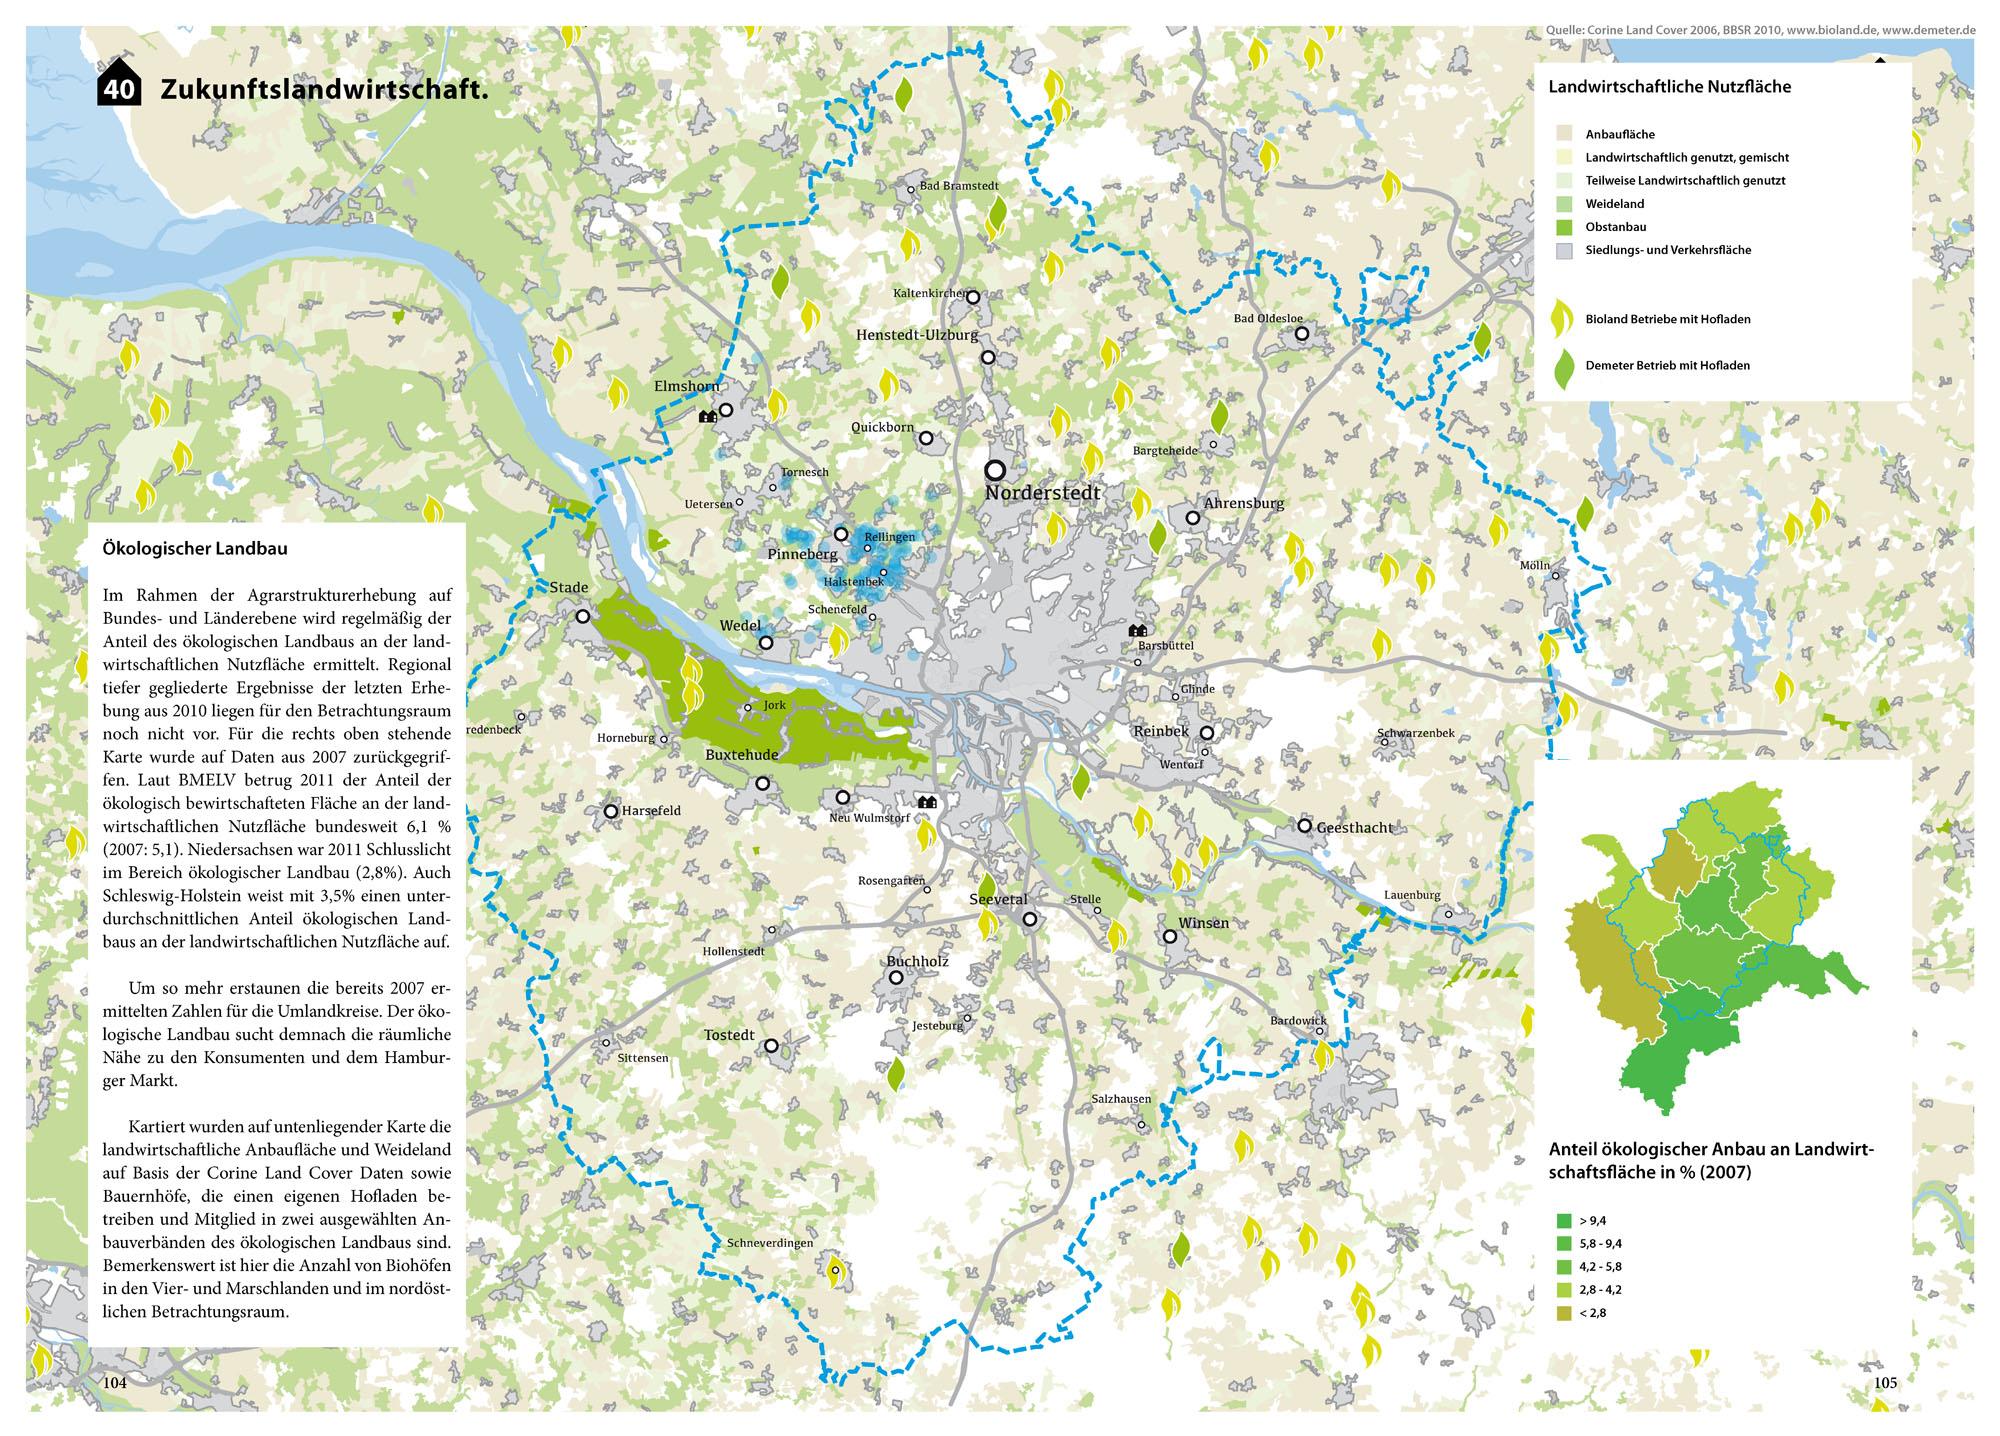 Suburbia Atlas Hamburg Stadteingang Typologien Vorort Karte Landwirtschaft Ökologie Landbau Karte